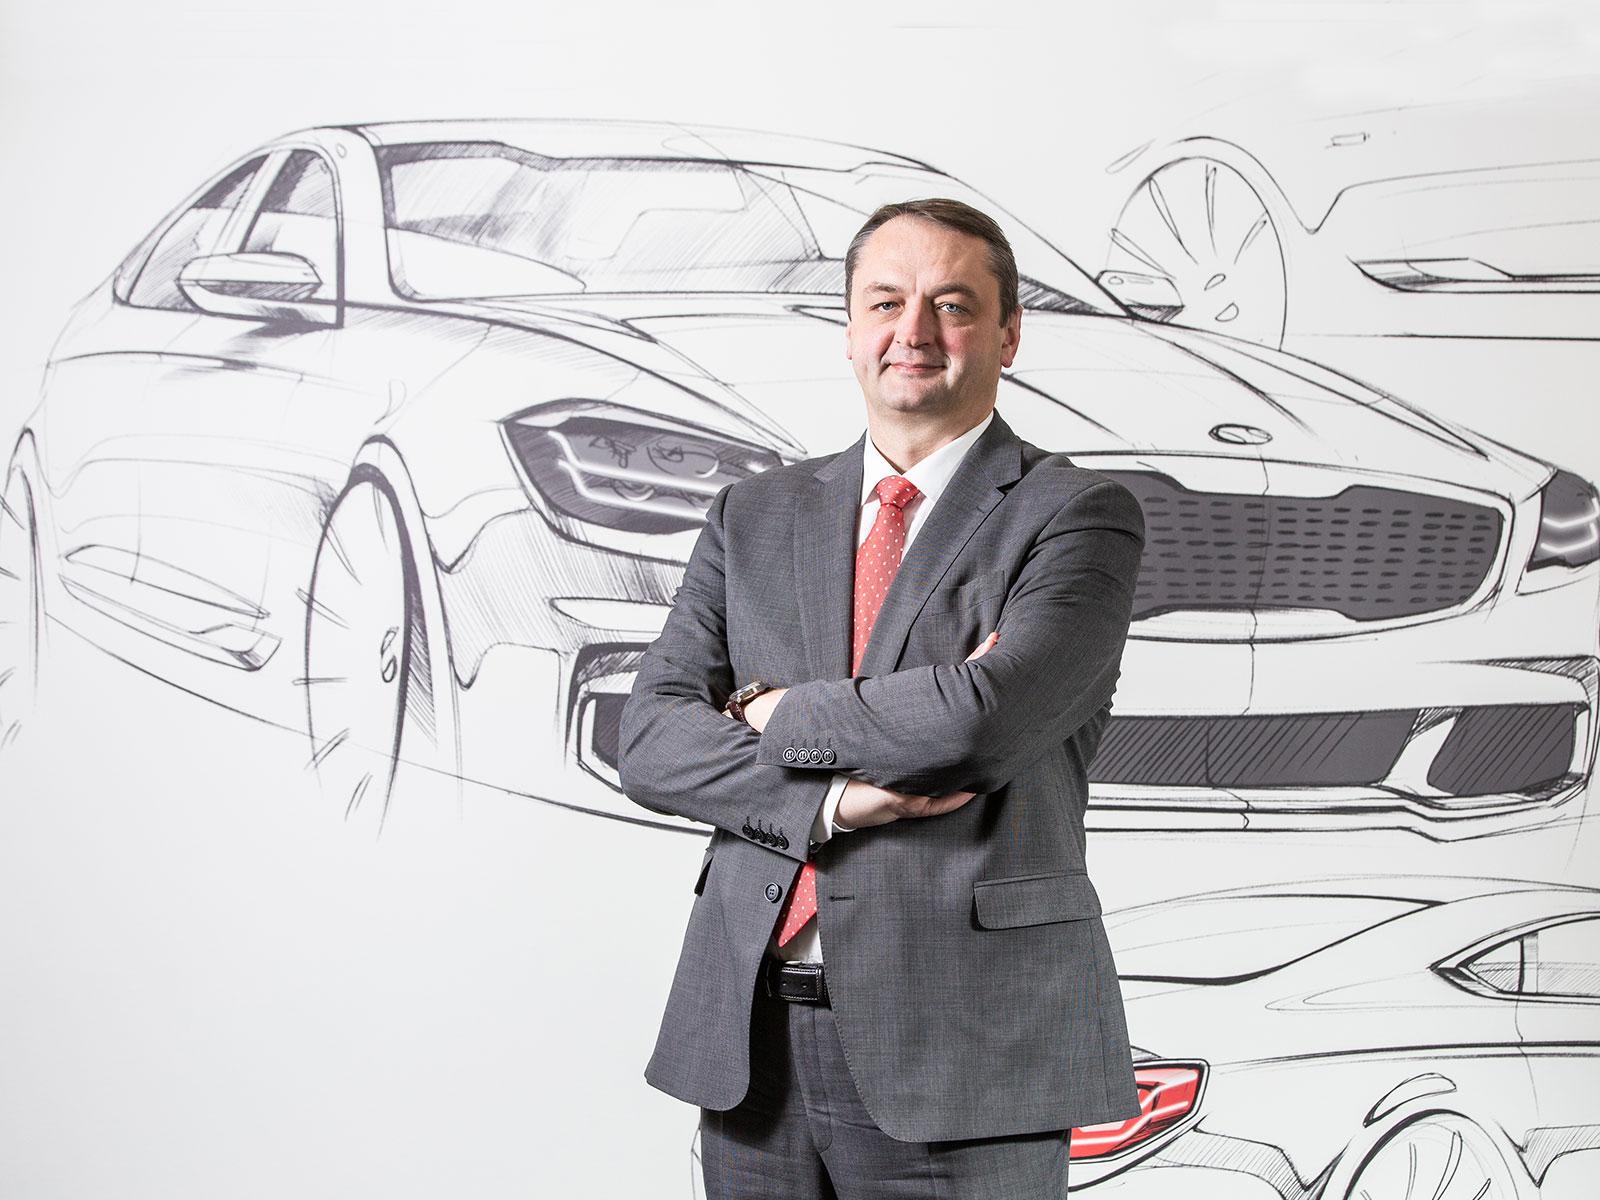 Заменят ли Kia Rio седан? Где взять дизель для Mohave 2? Туманные перспективы Kia Telluride в РФ